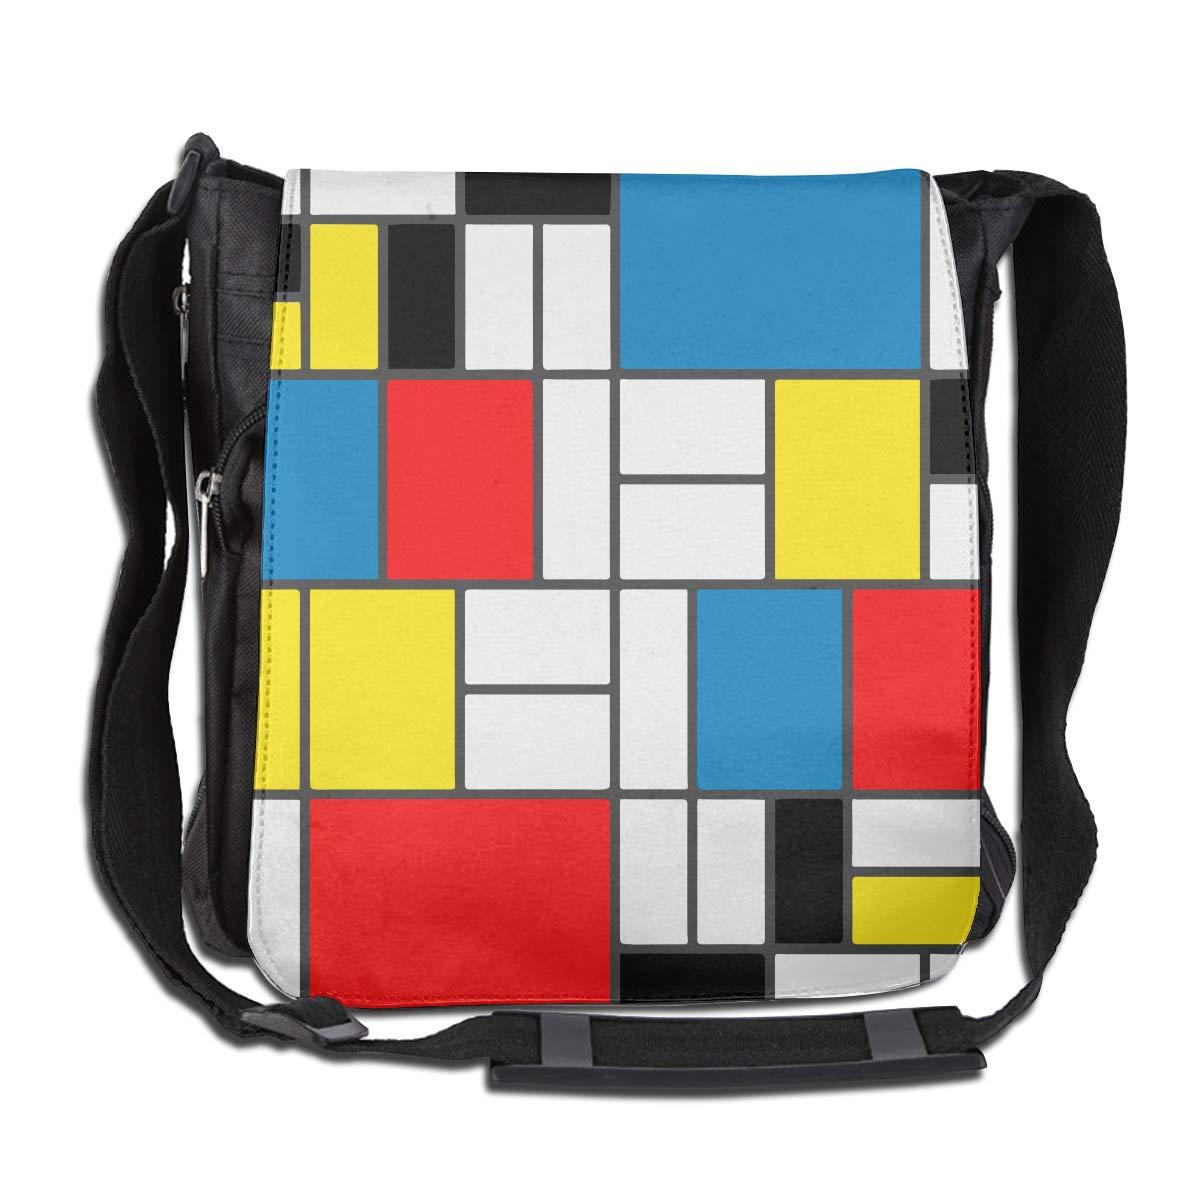 LRHUI Mondrian Style Unisex Multifunction Narrow Single Shoulder Bag Diagonal Travel Bag